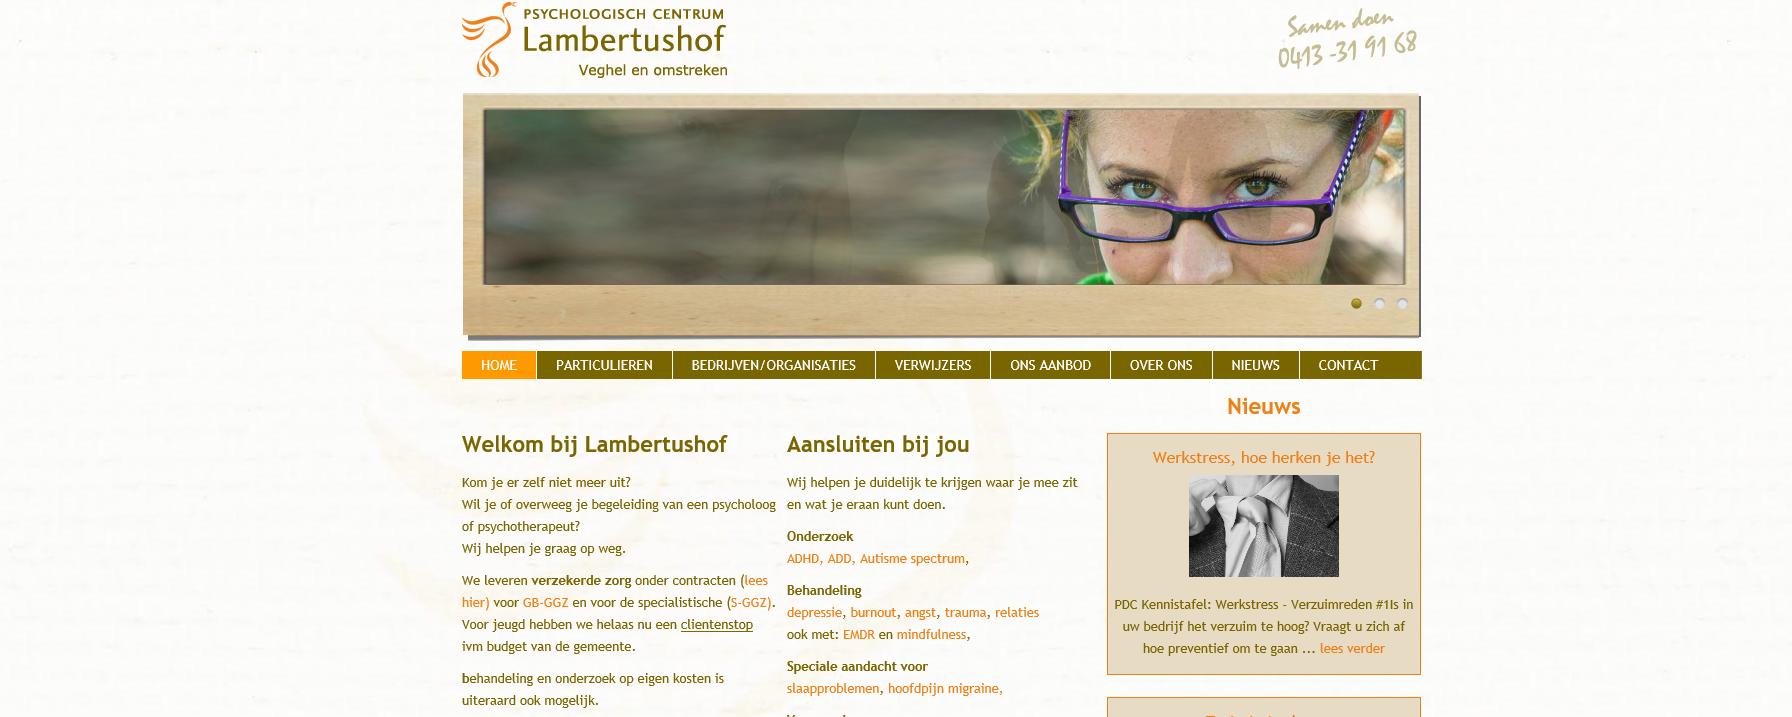 Lambertushof